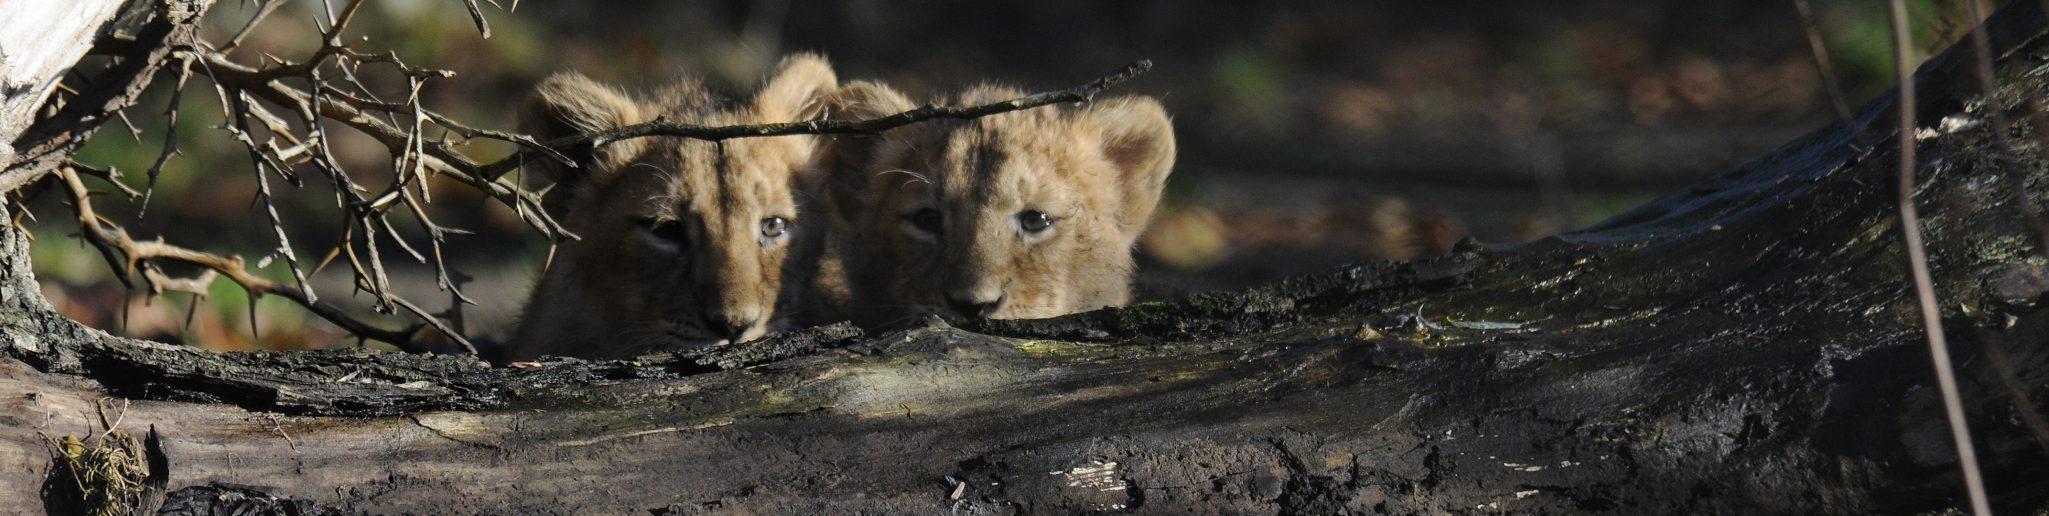 Aziatische leeuwenwelpjes verstoppen achter boomstam